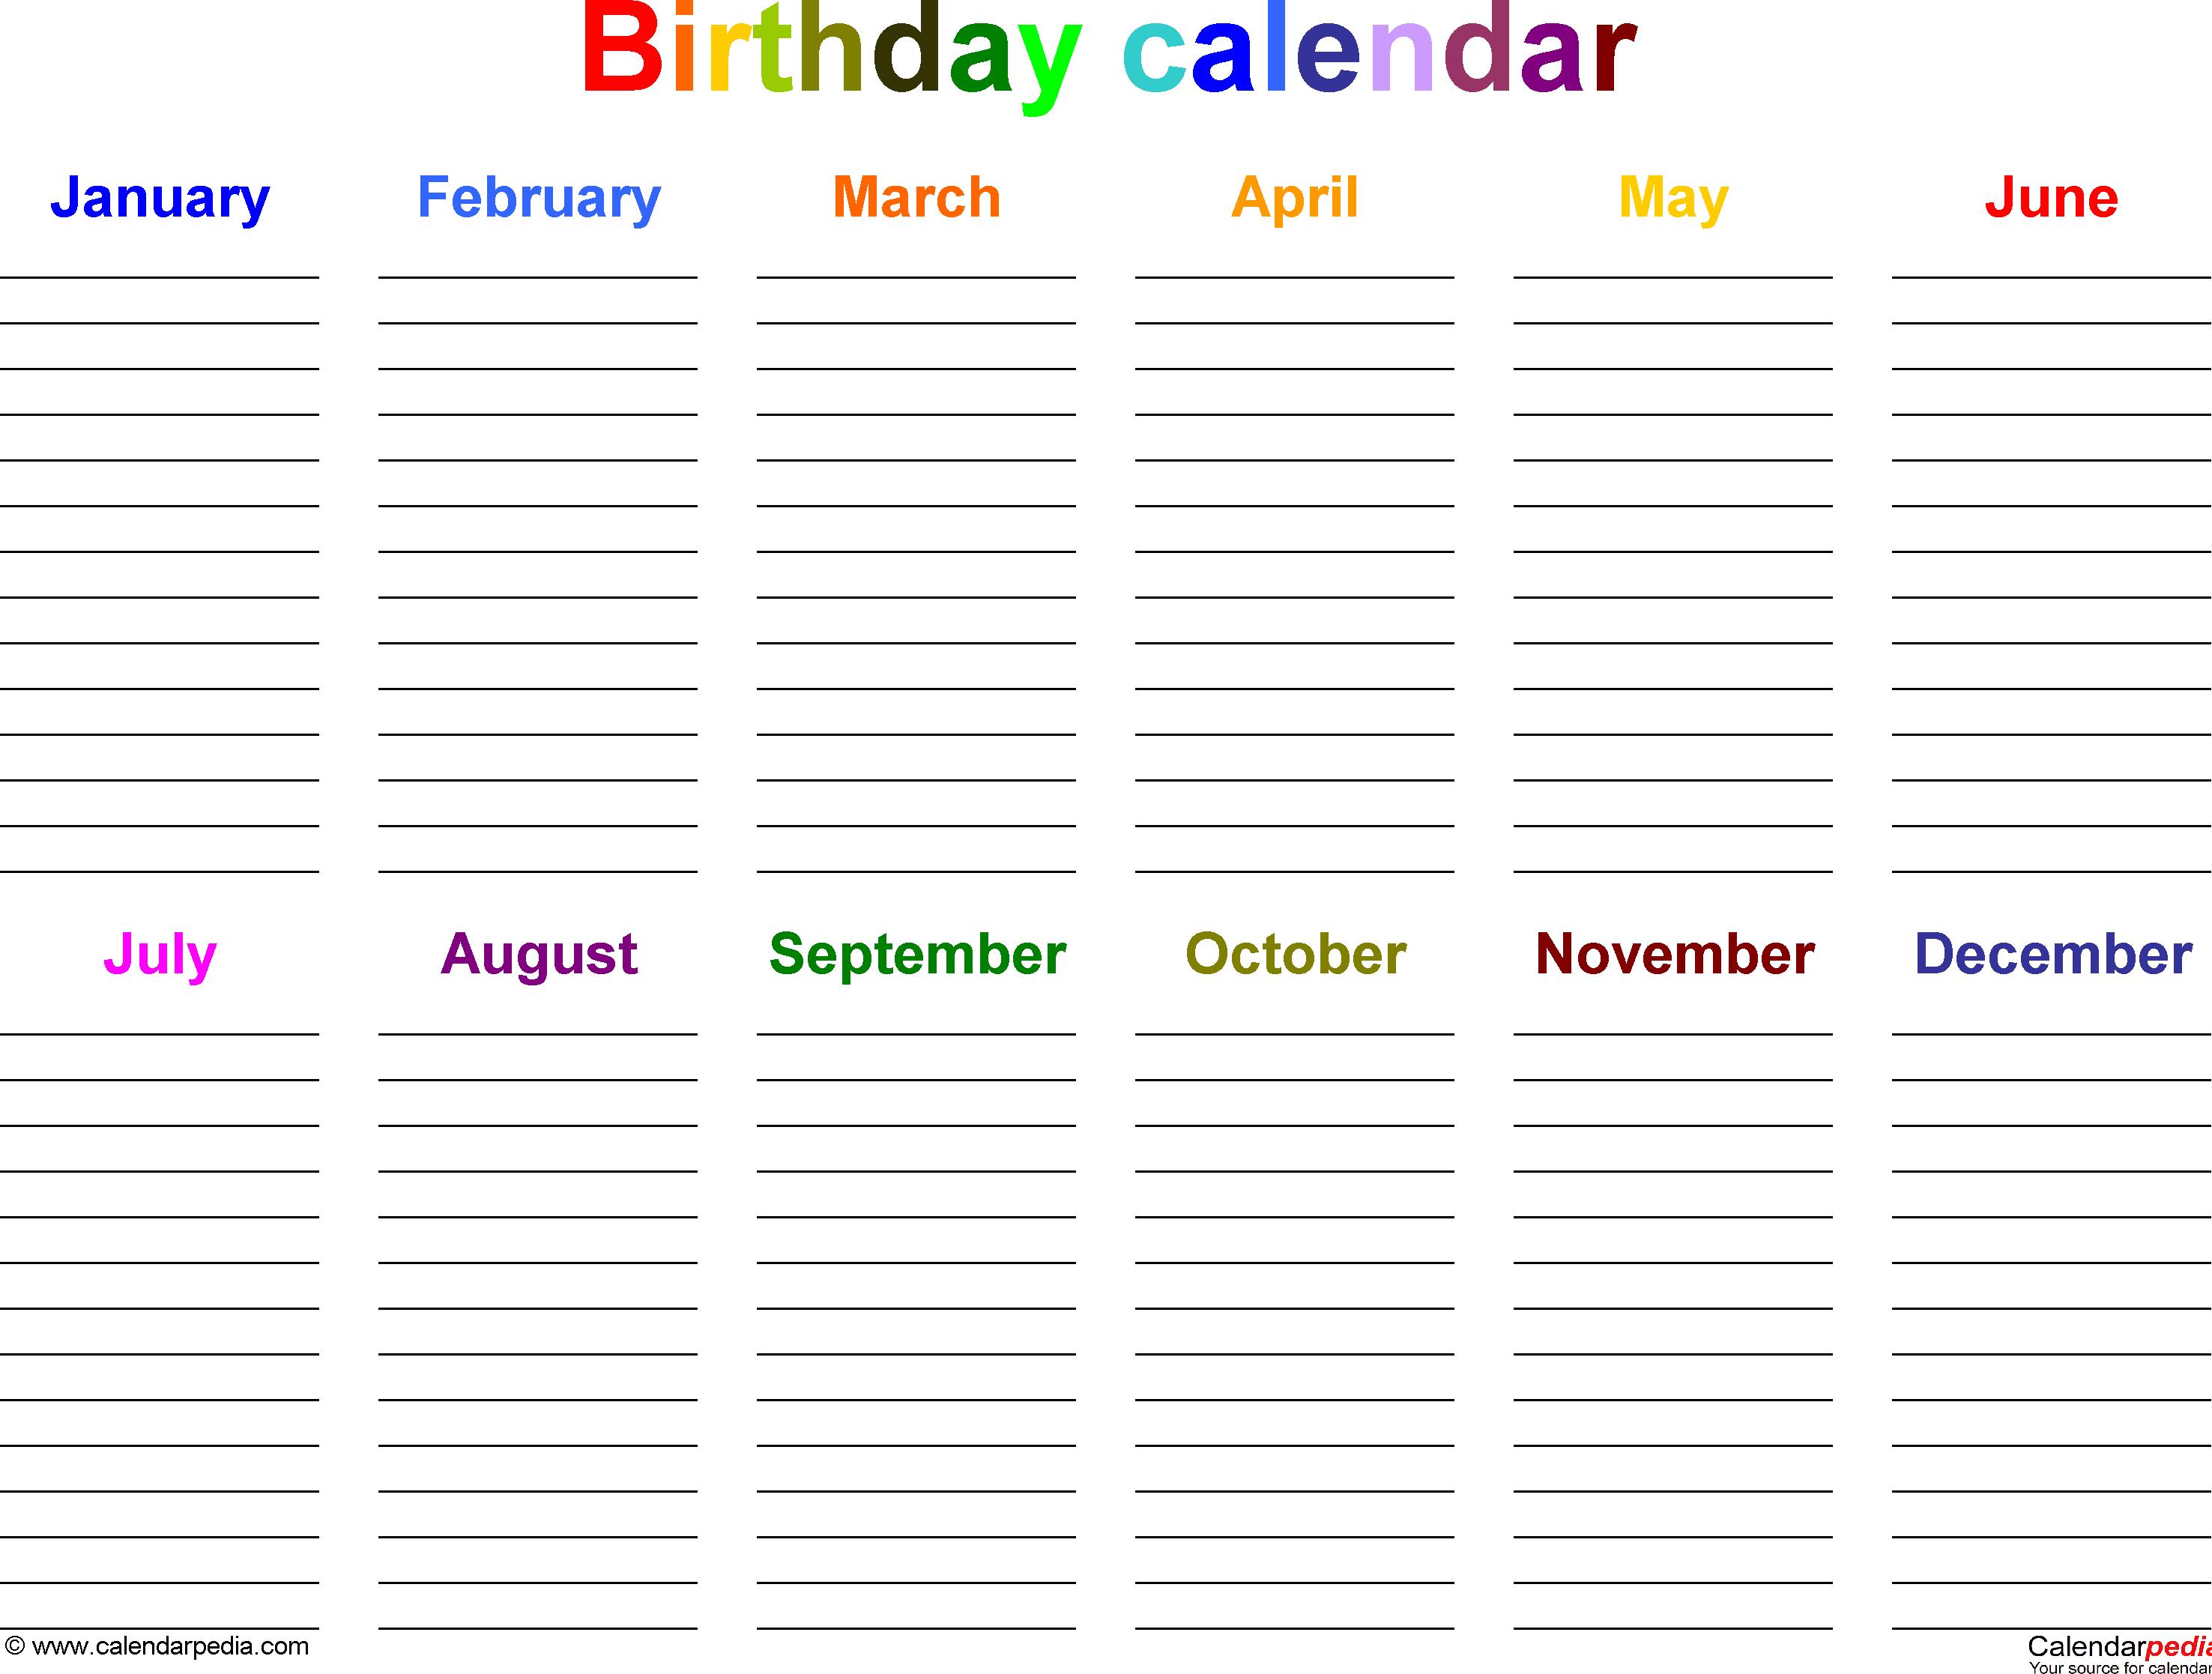 Julian Calendar 2017 | Printable 2017 Calendars intended for Frame Birthday Calendar Templates Free